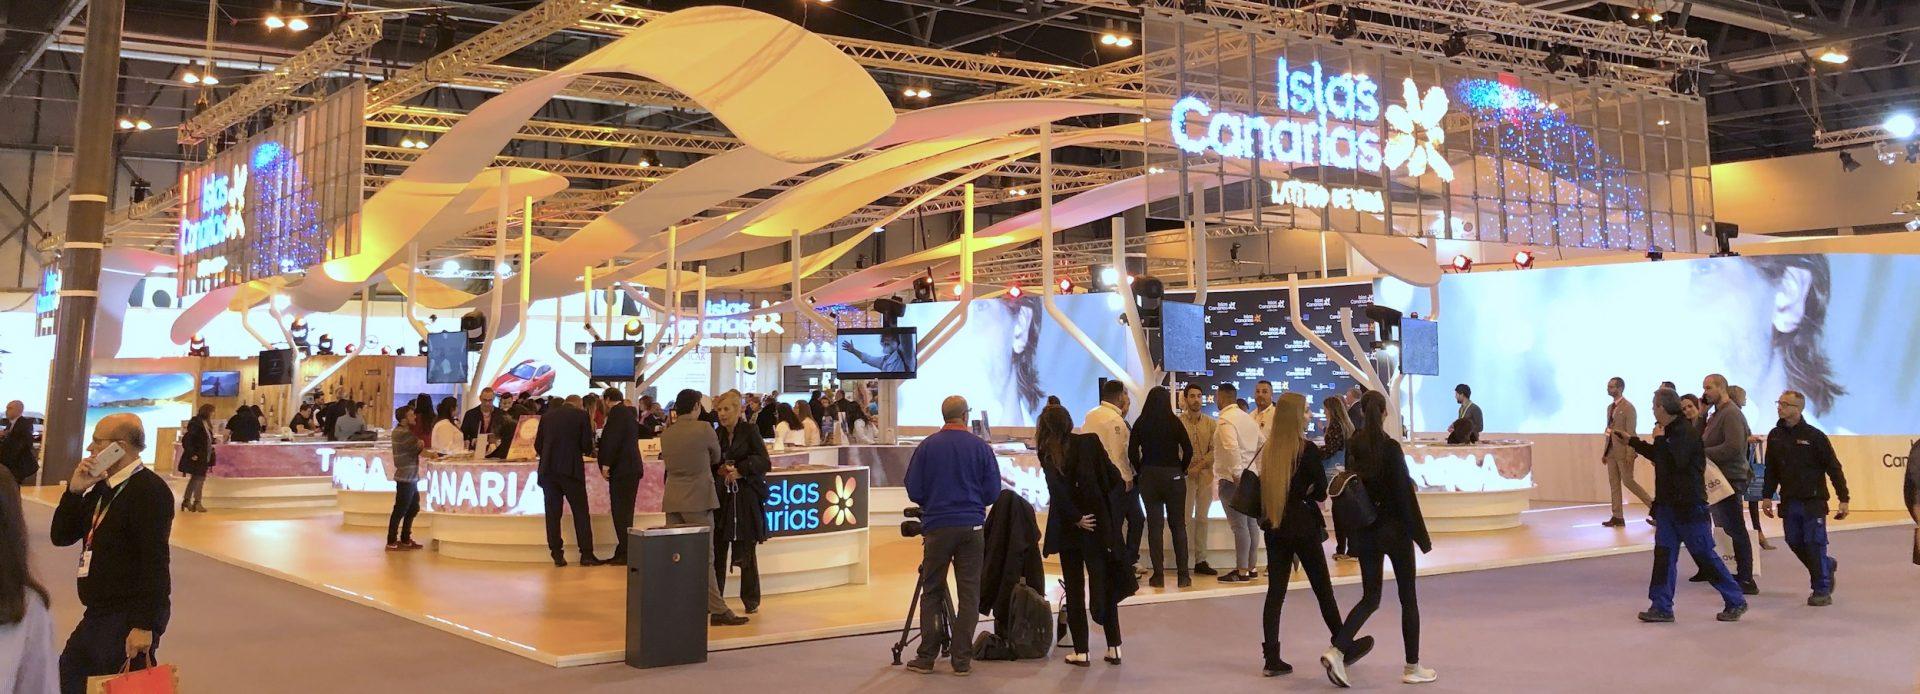 Panorámica del stand de Canarias en FITUR 2019